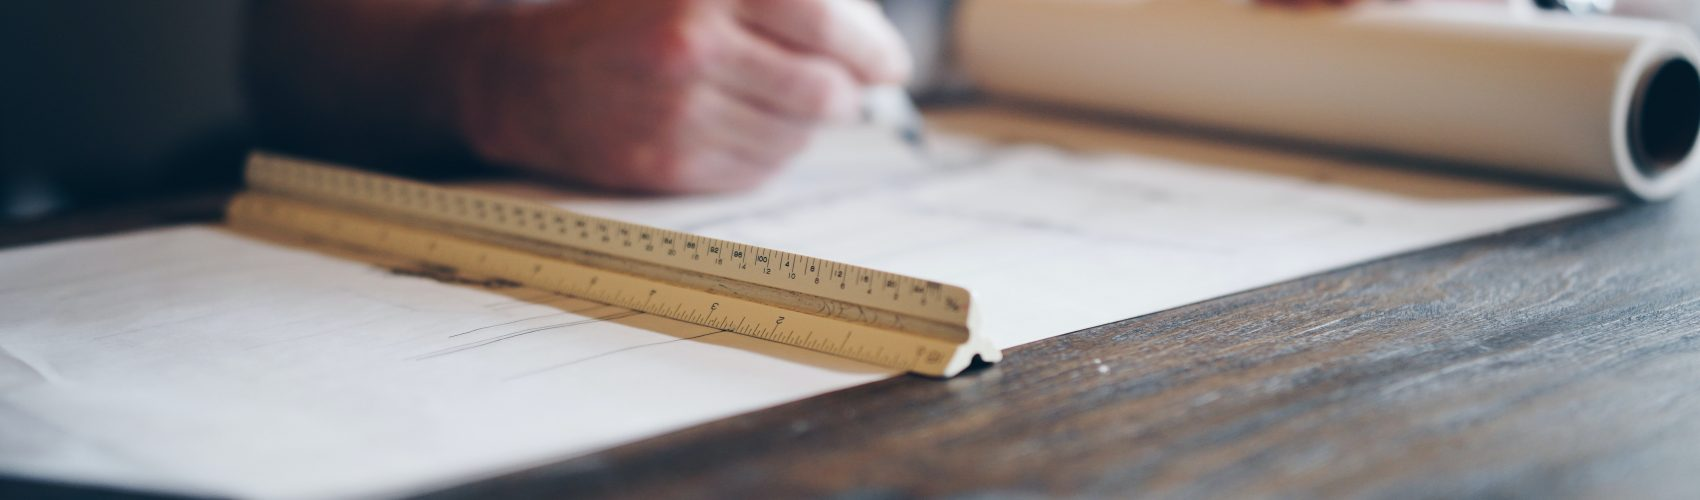 man creating blueprint